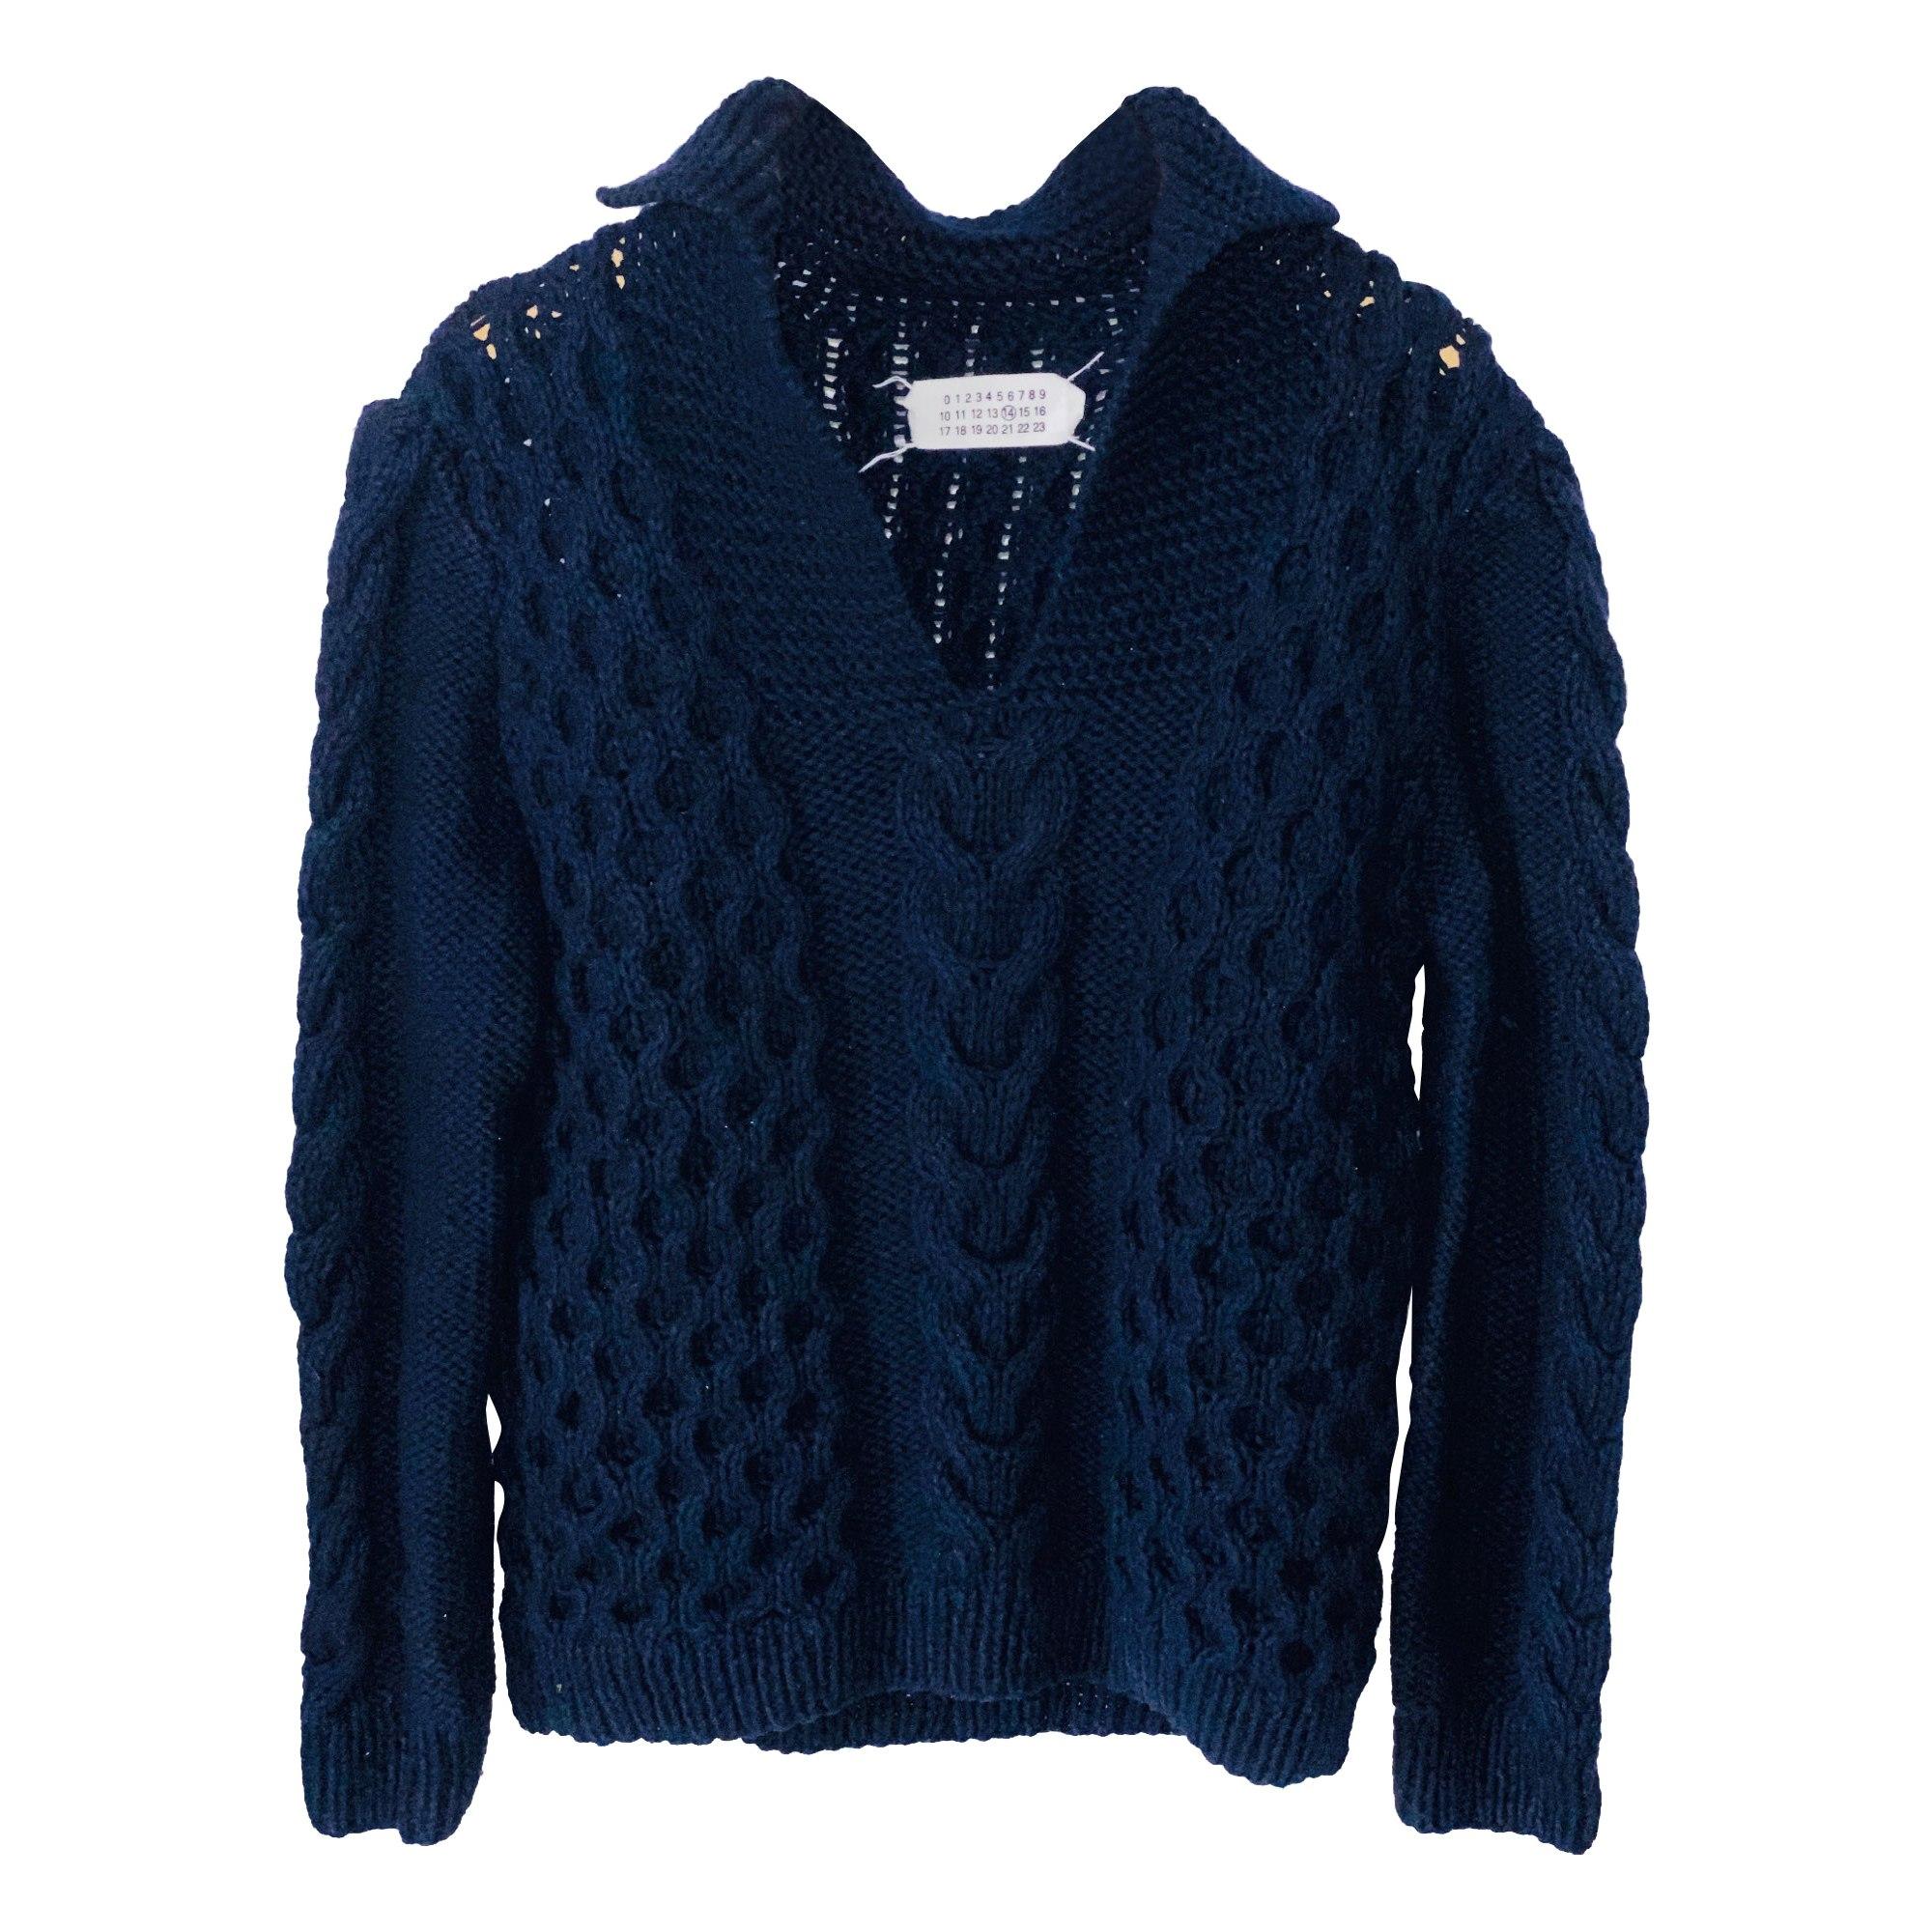 Pull MAISON MARTIN MARGIELA Bleu, bleu marine, bleu turquoise